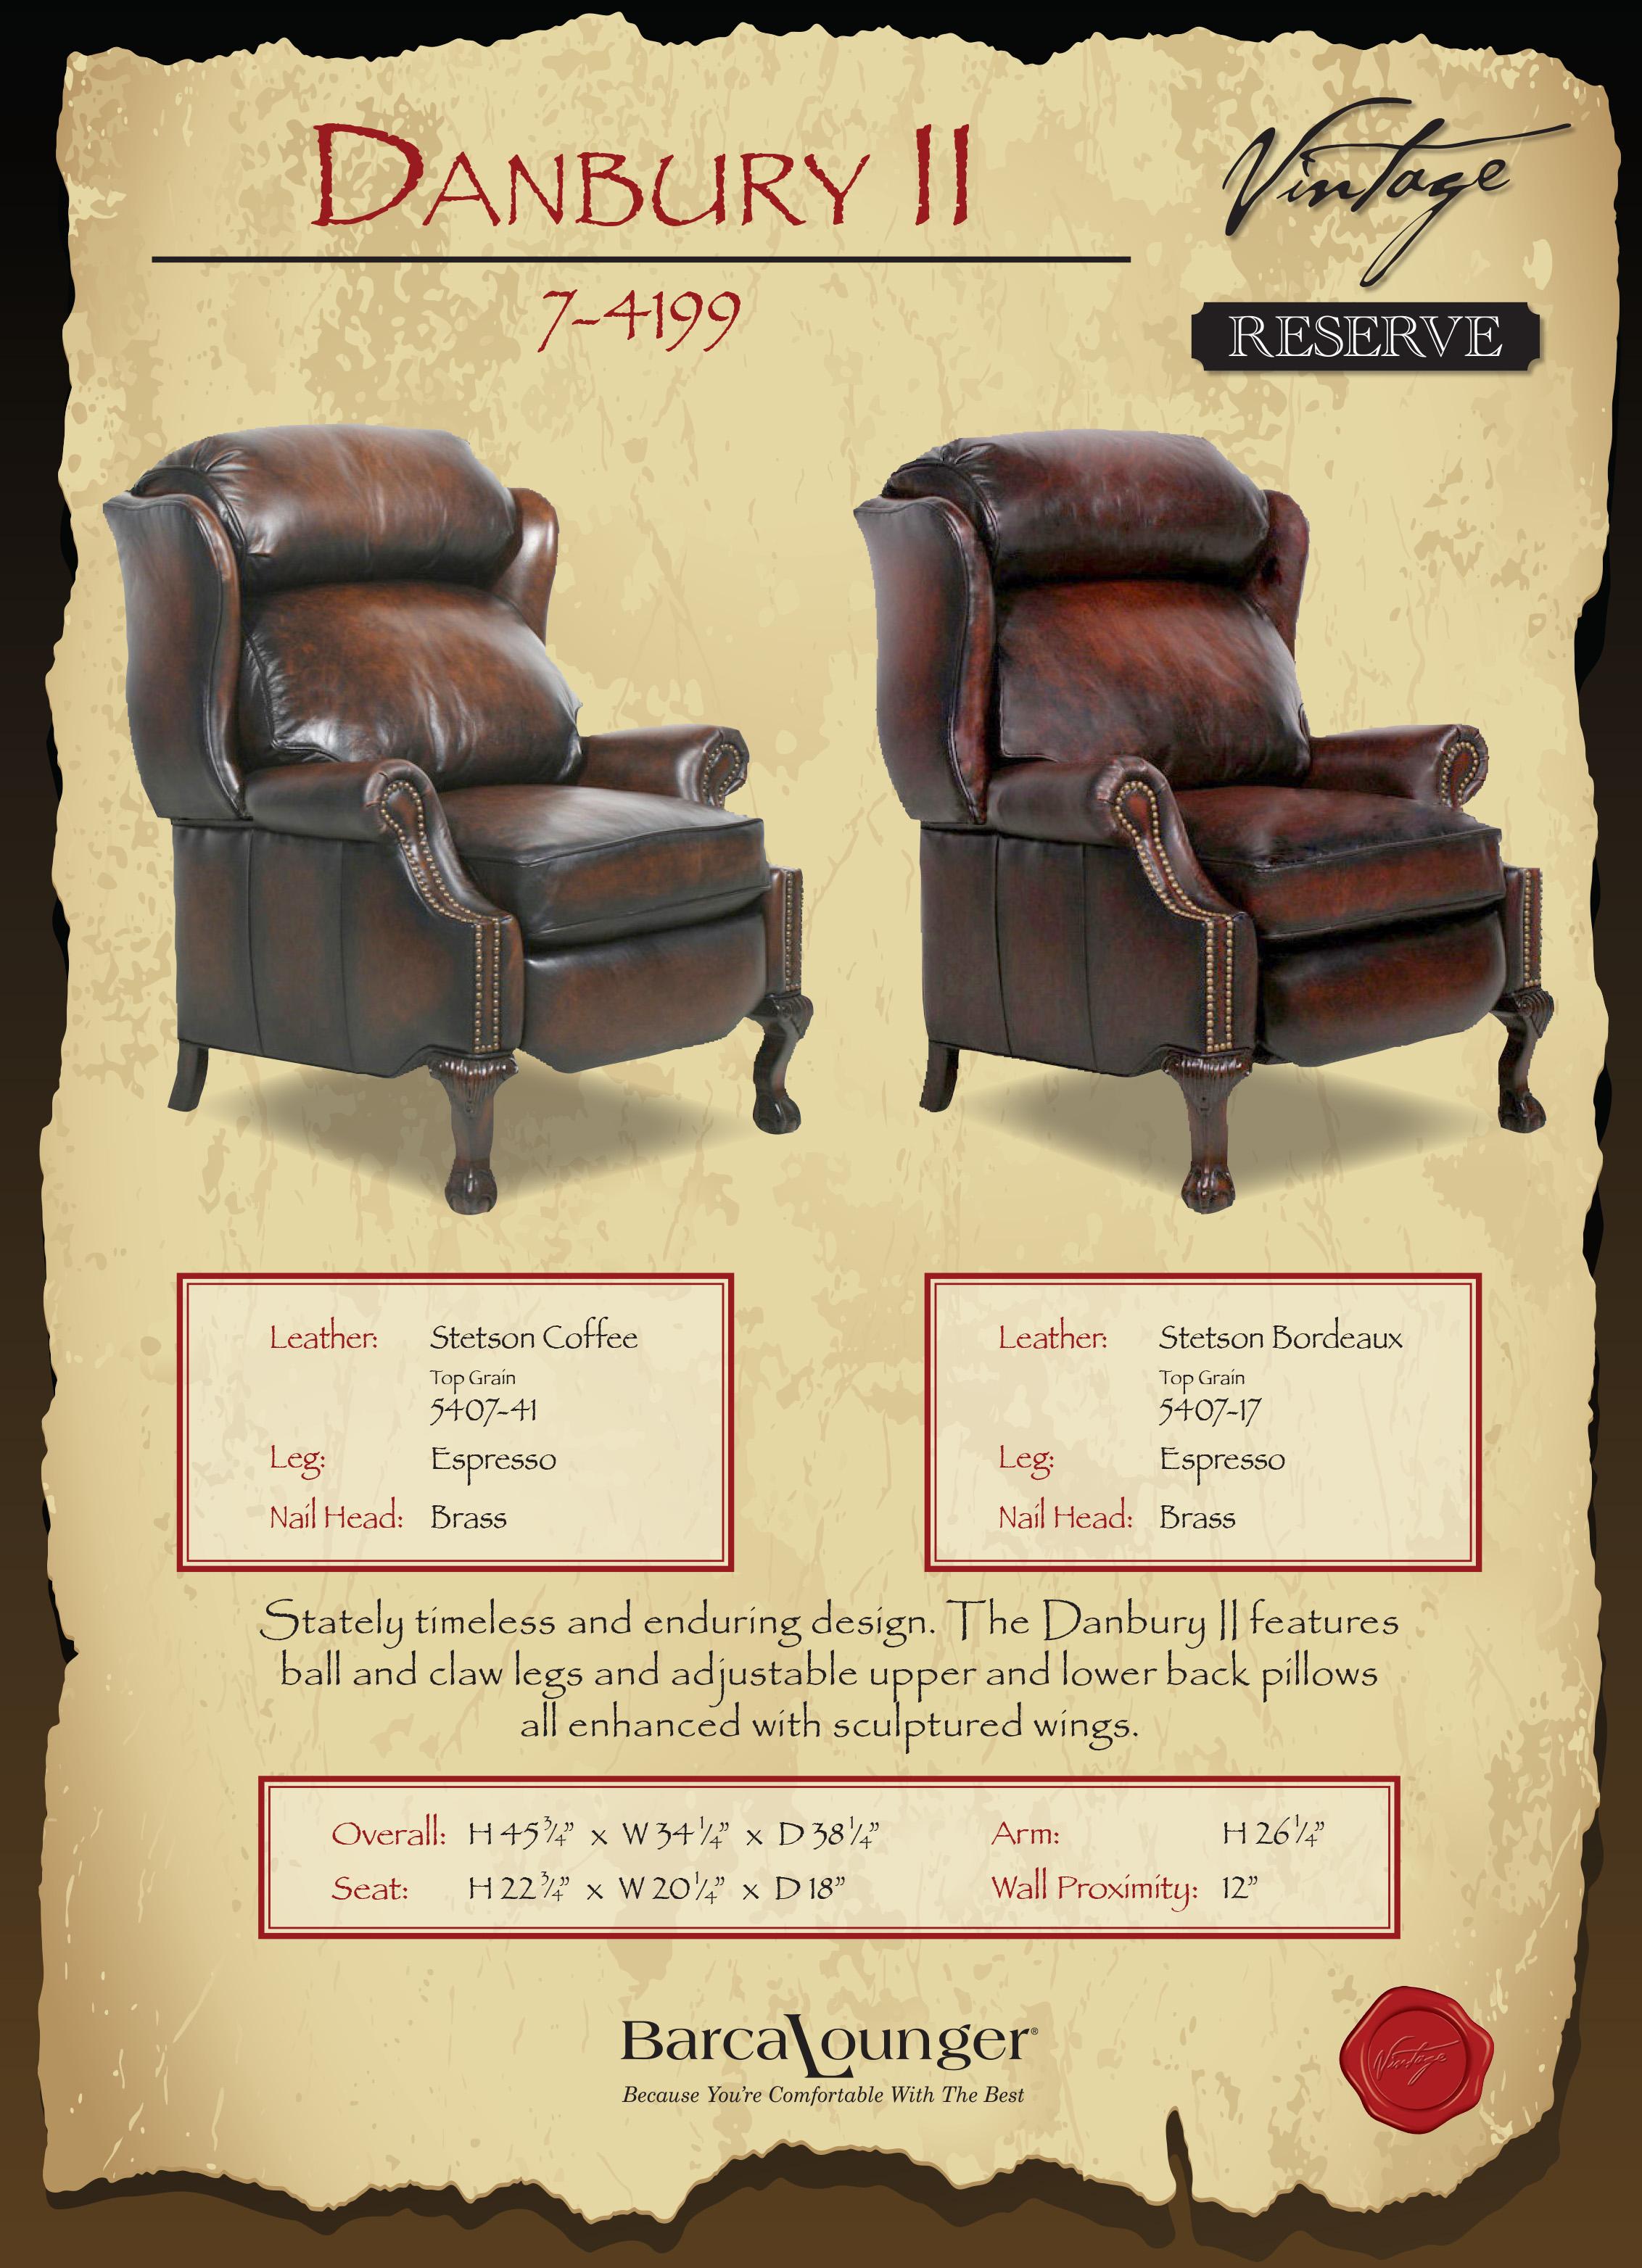 Barcalounger Danbury II Recliner Chair Dimensions